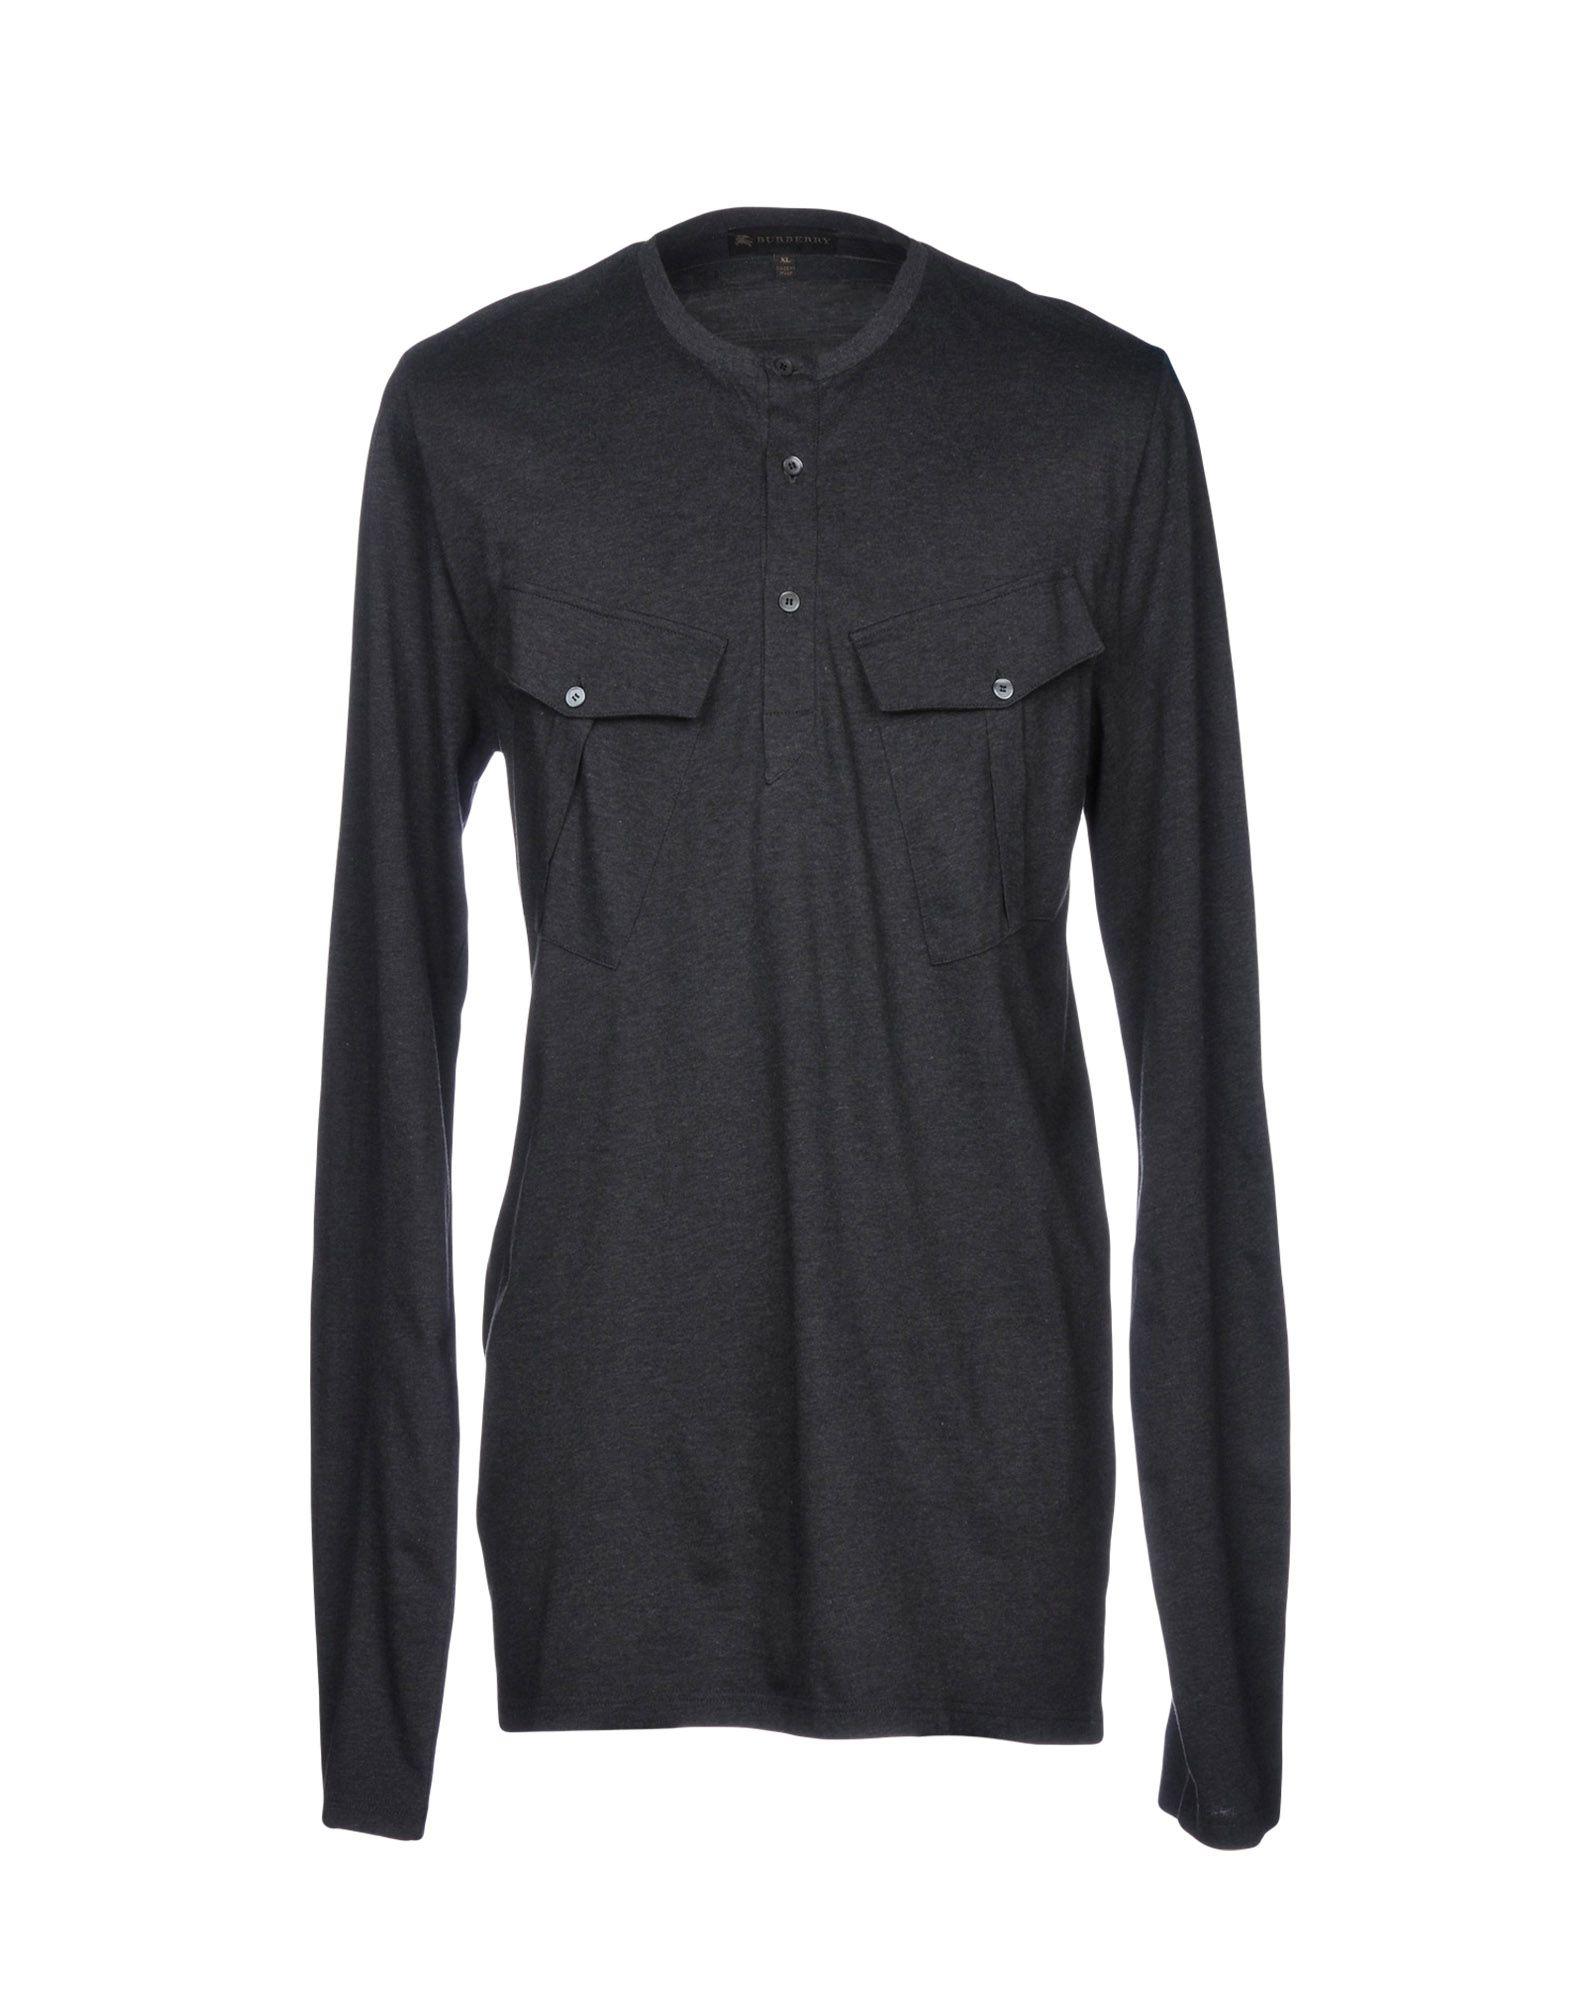 T-Shirt Burberry Donna - Acquista online su